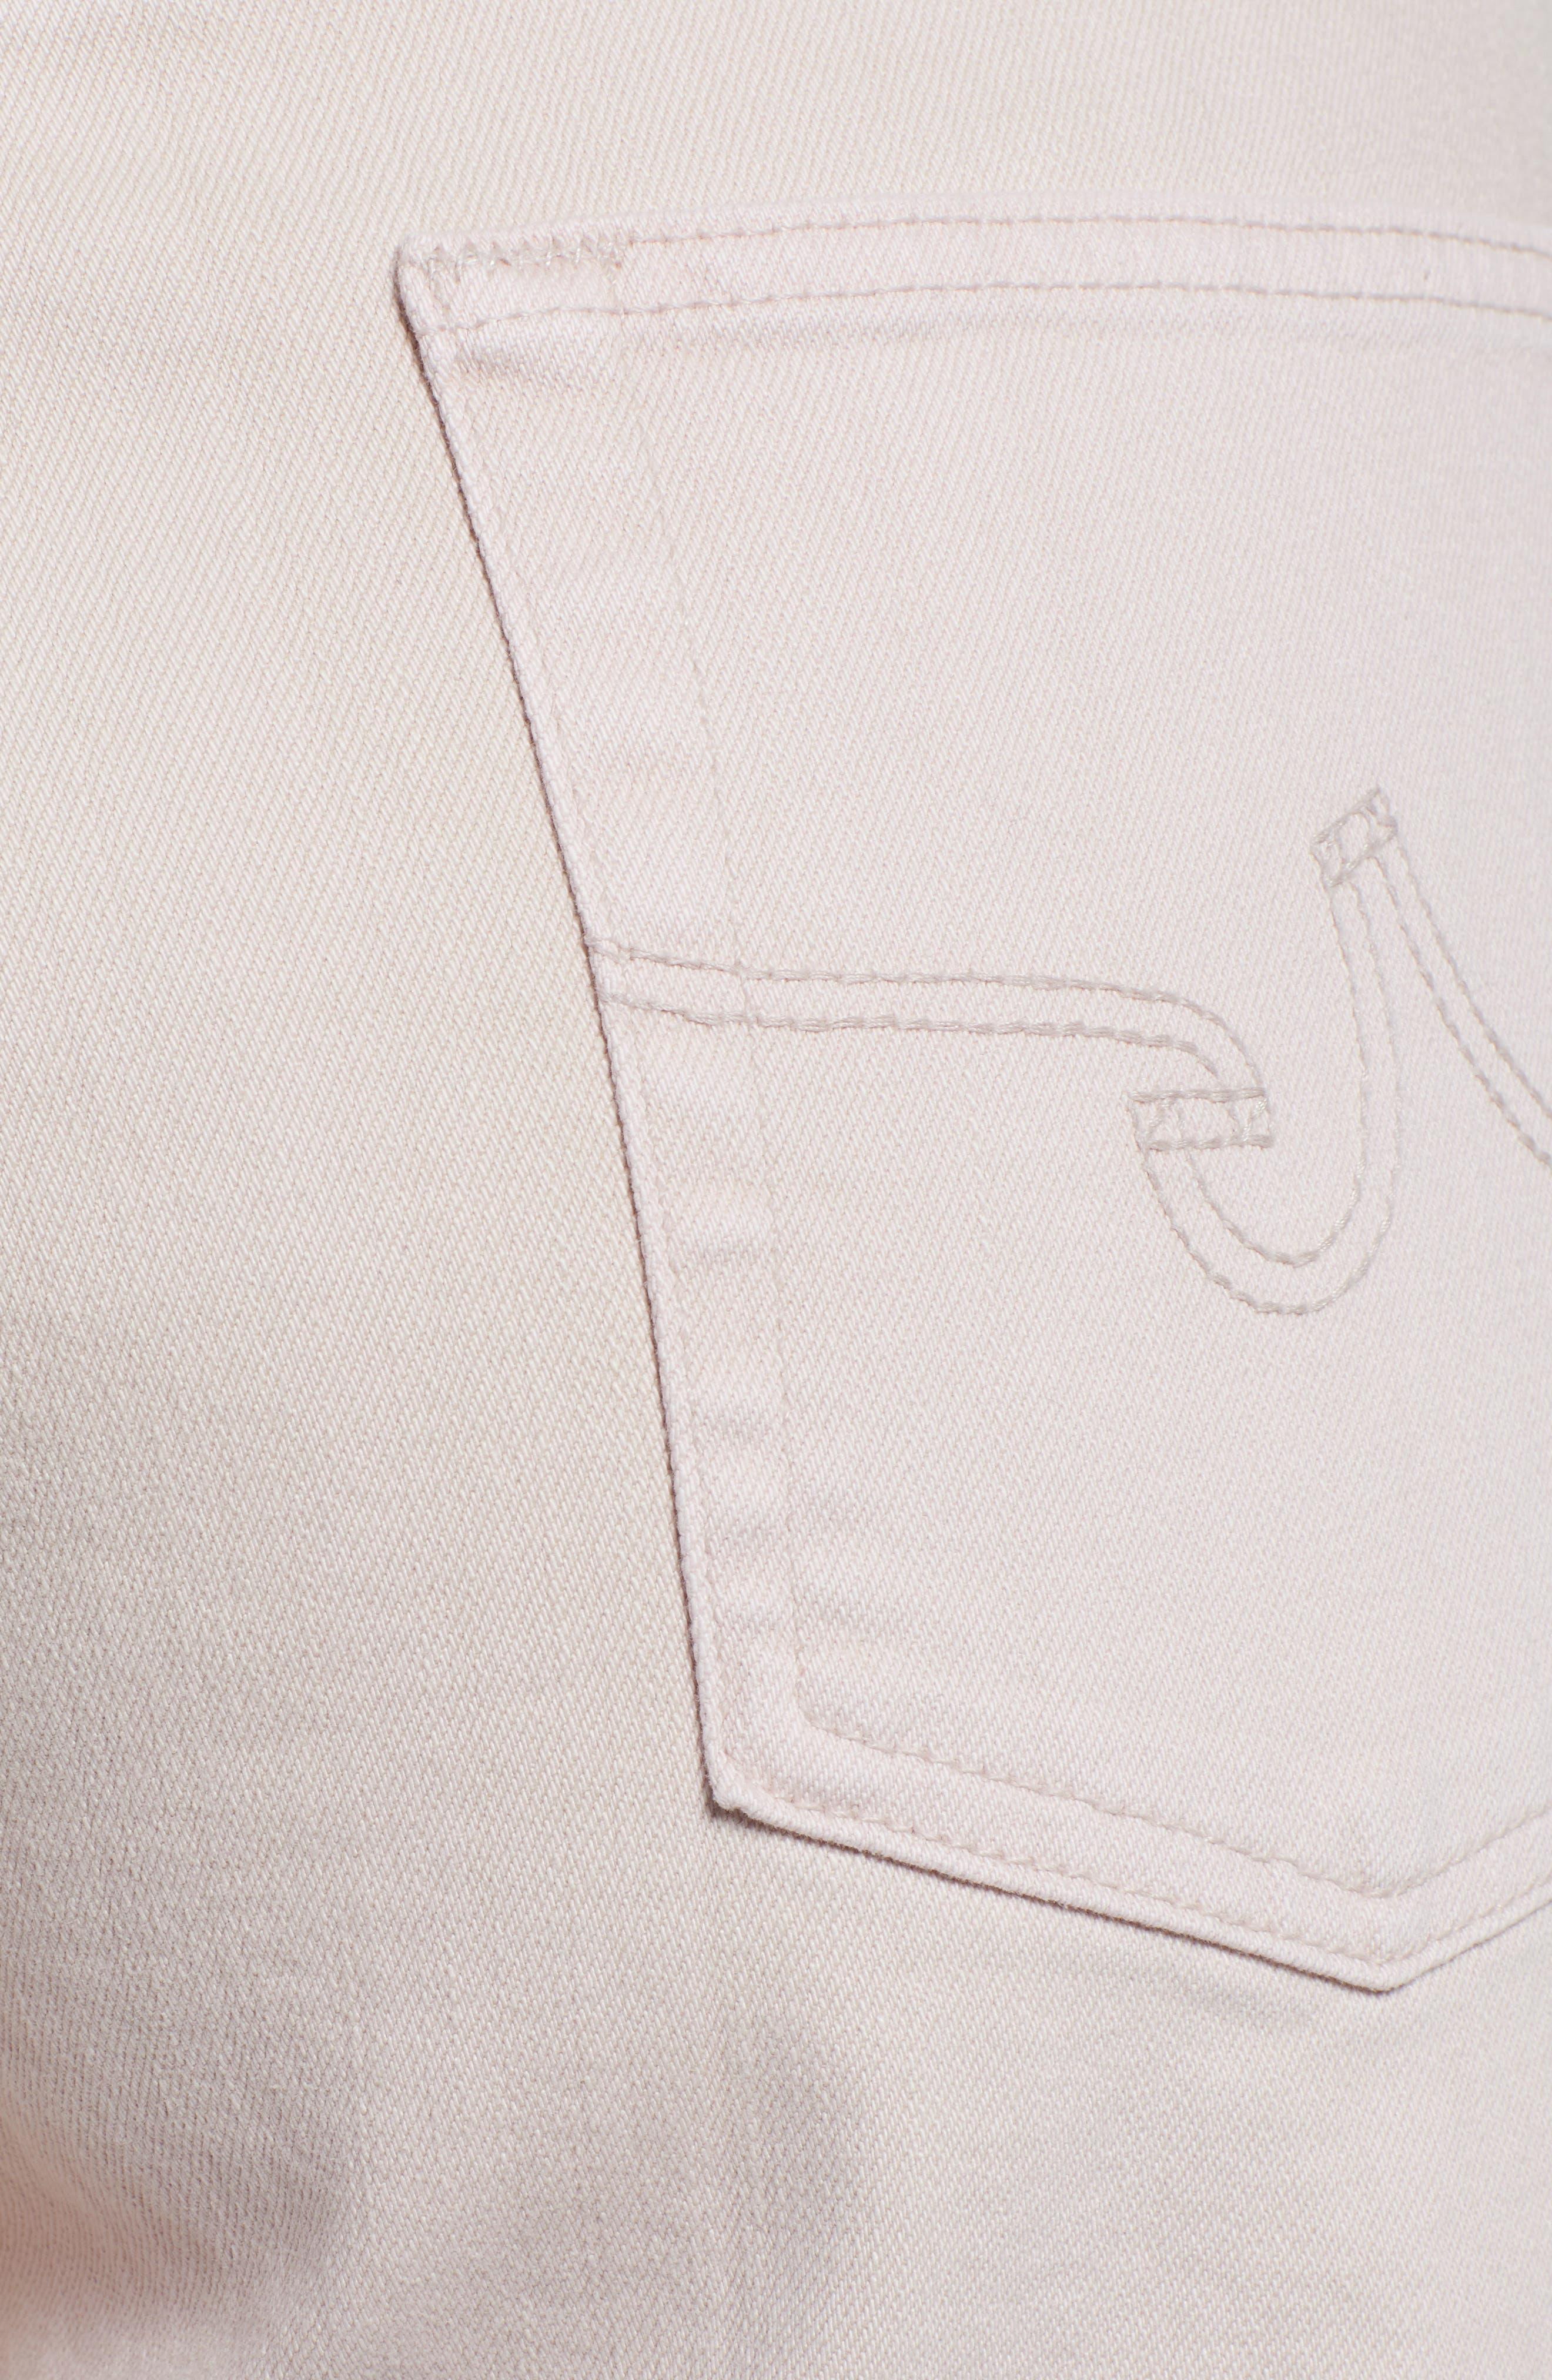 AG, Etta High Waist Crop Wide Leg Jeans, Alternate thumbnail 6, color, SULFUR PEAKED PINK